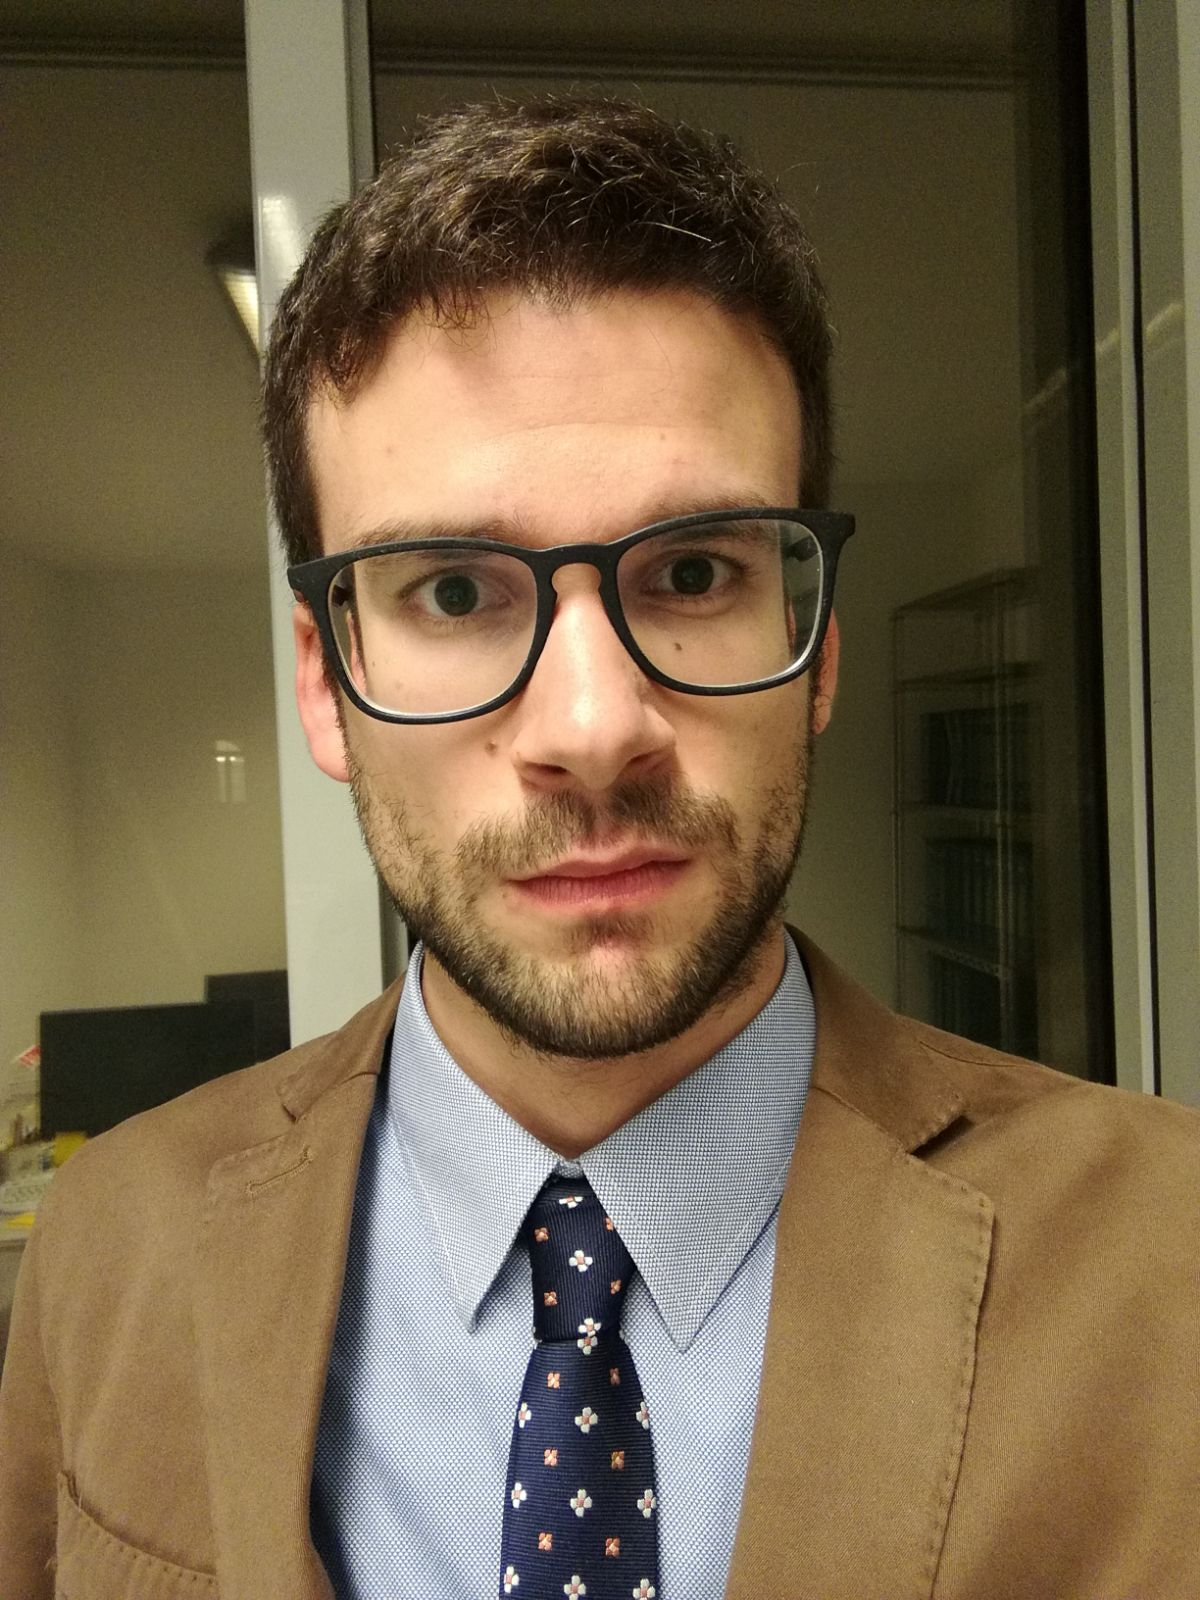 Giacomo Taccari